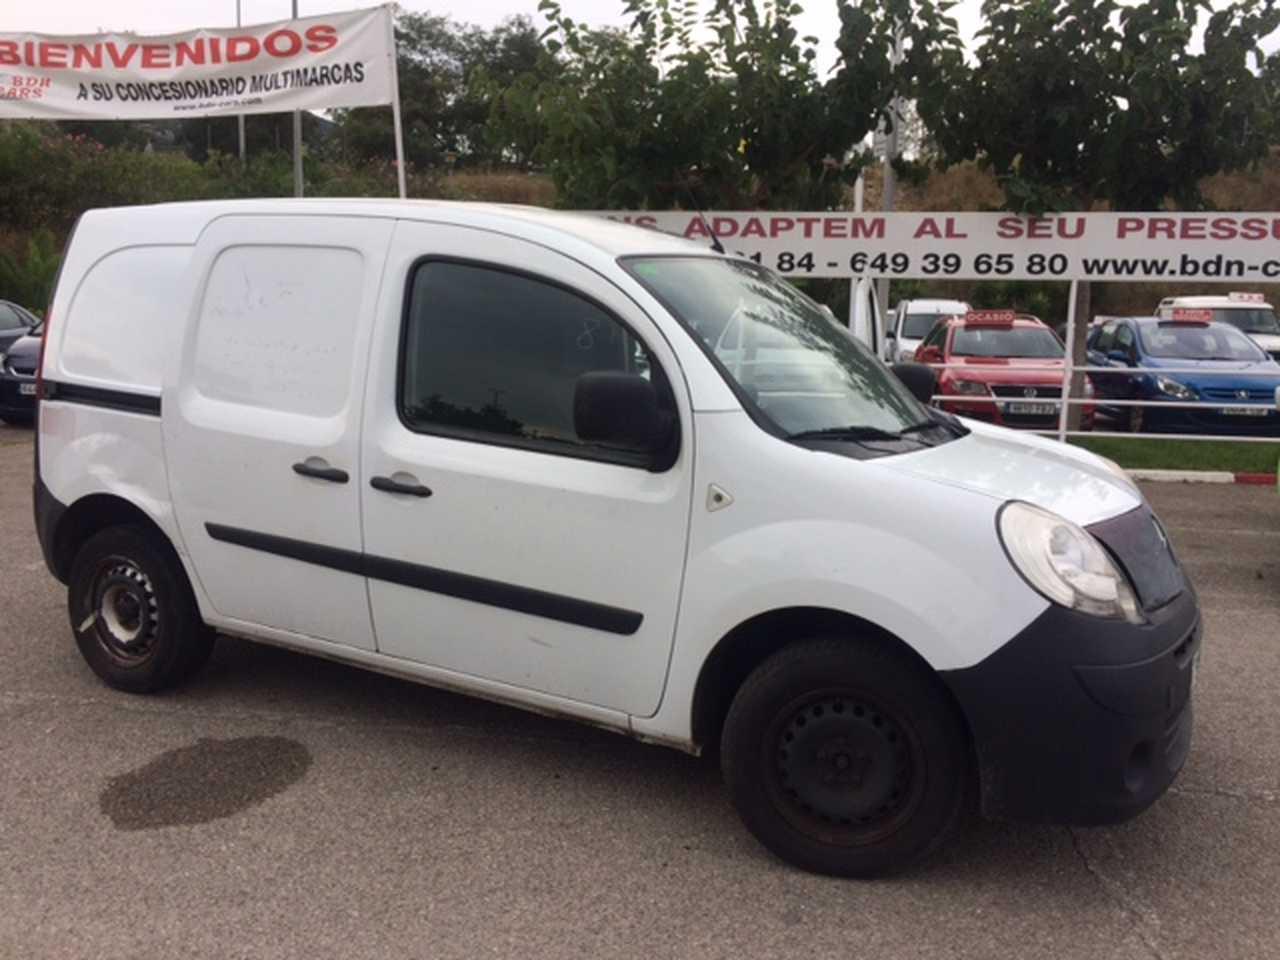 Renault Kangoo 1.5 DCI CERRADA   - Foto 1